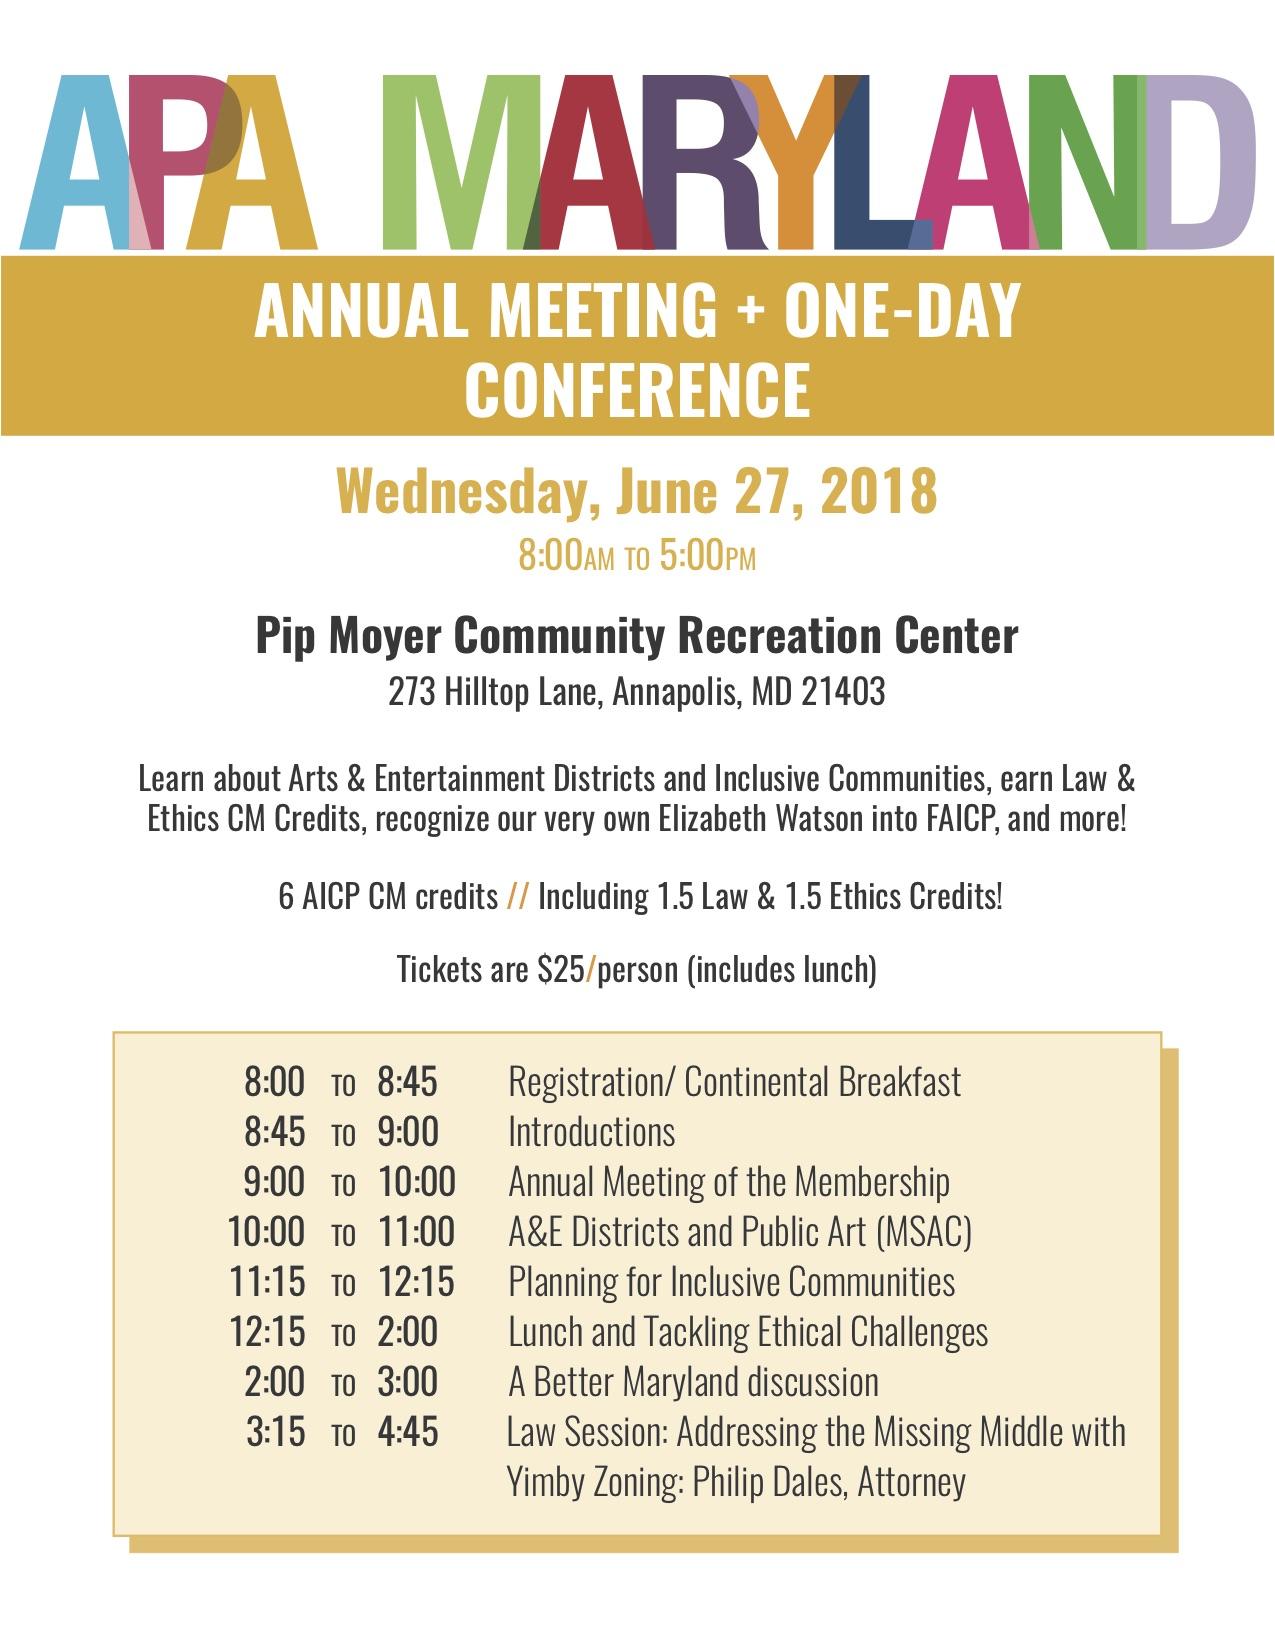 APA Annual Meeting Flyer.jpg